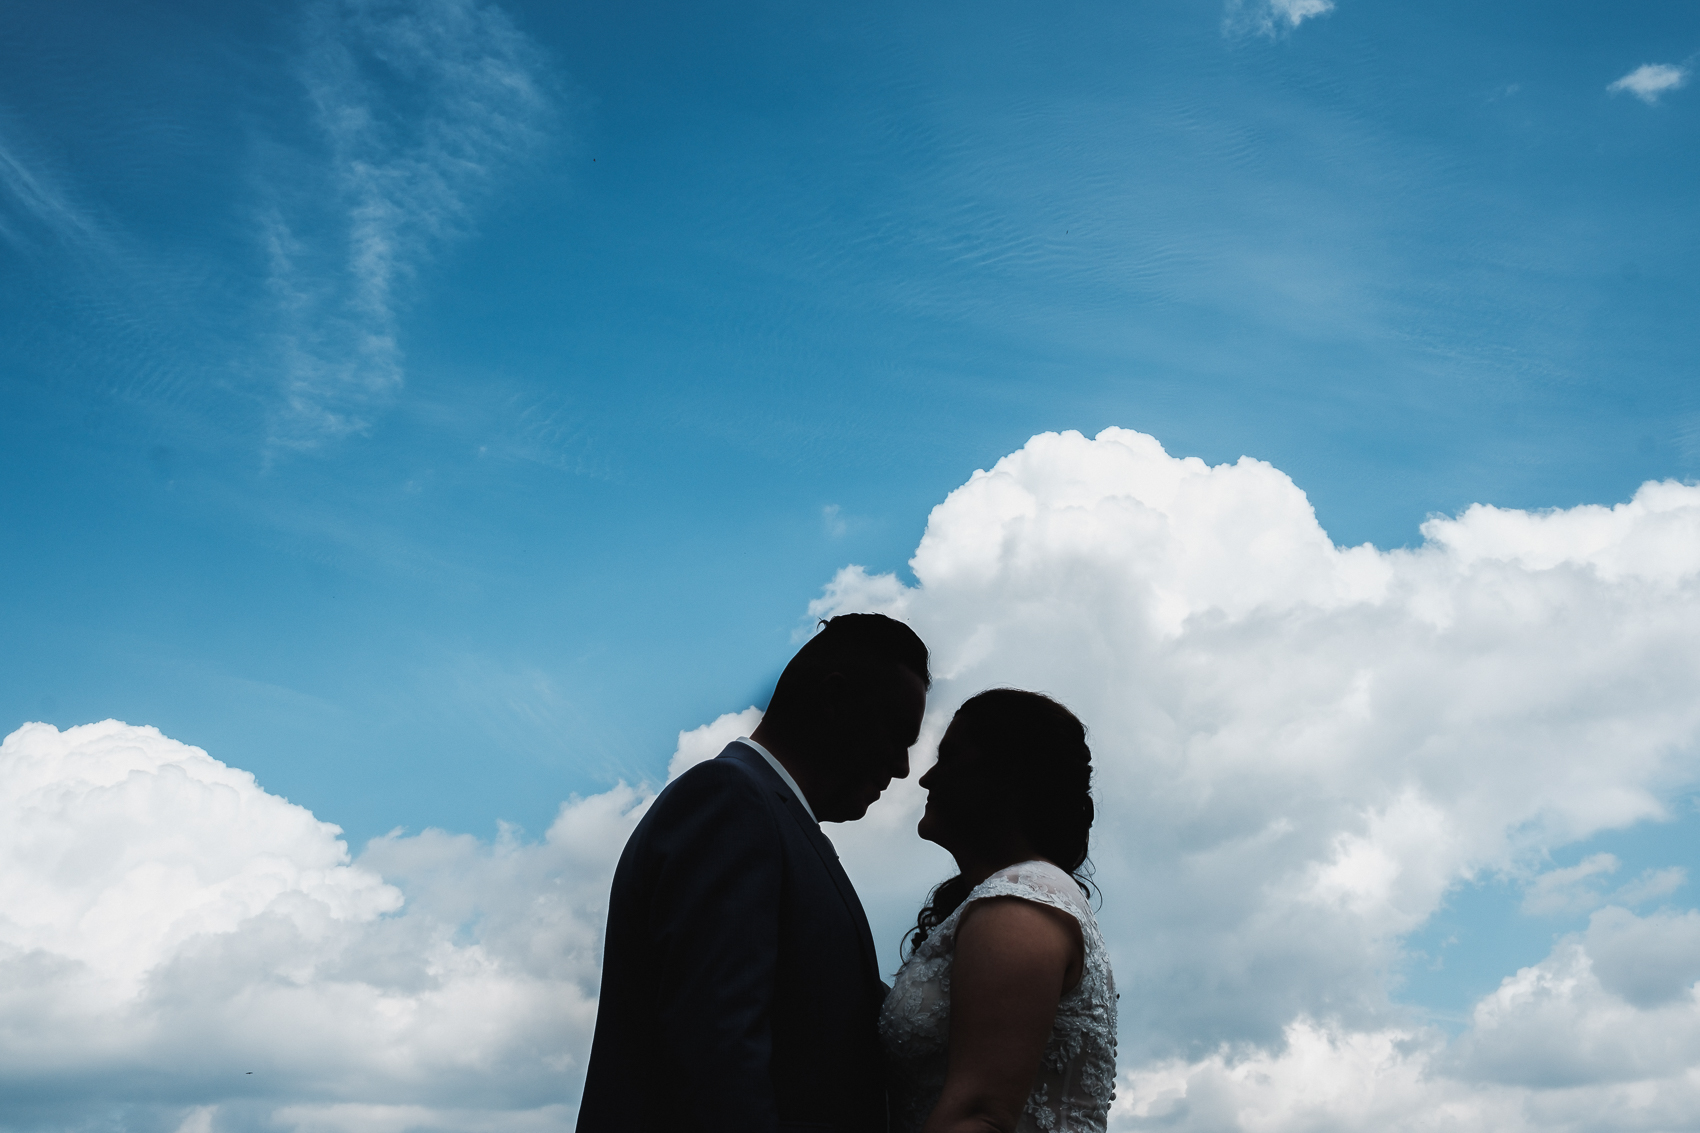 iso800 - trouwfotograaf gooik jana davy-25.jpg